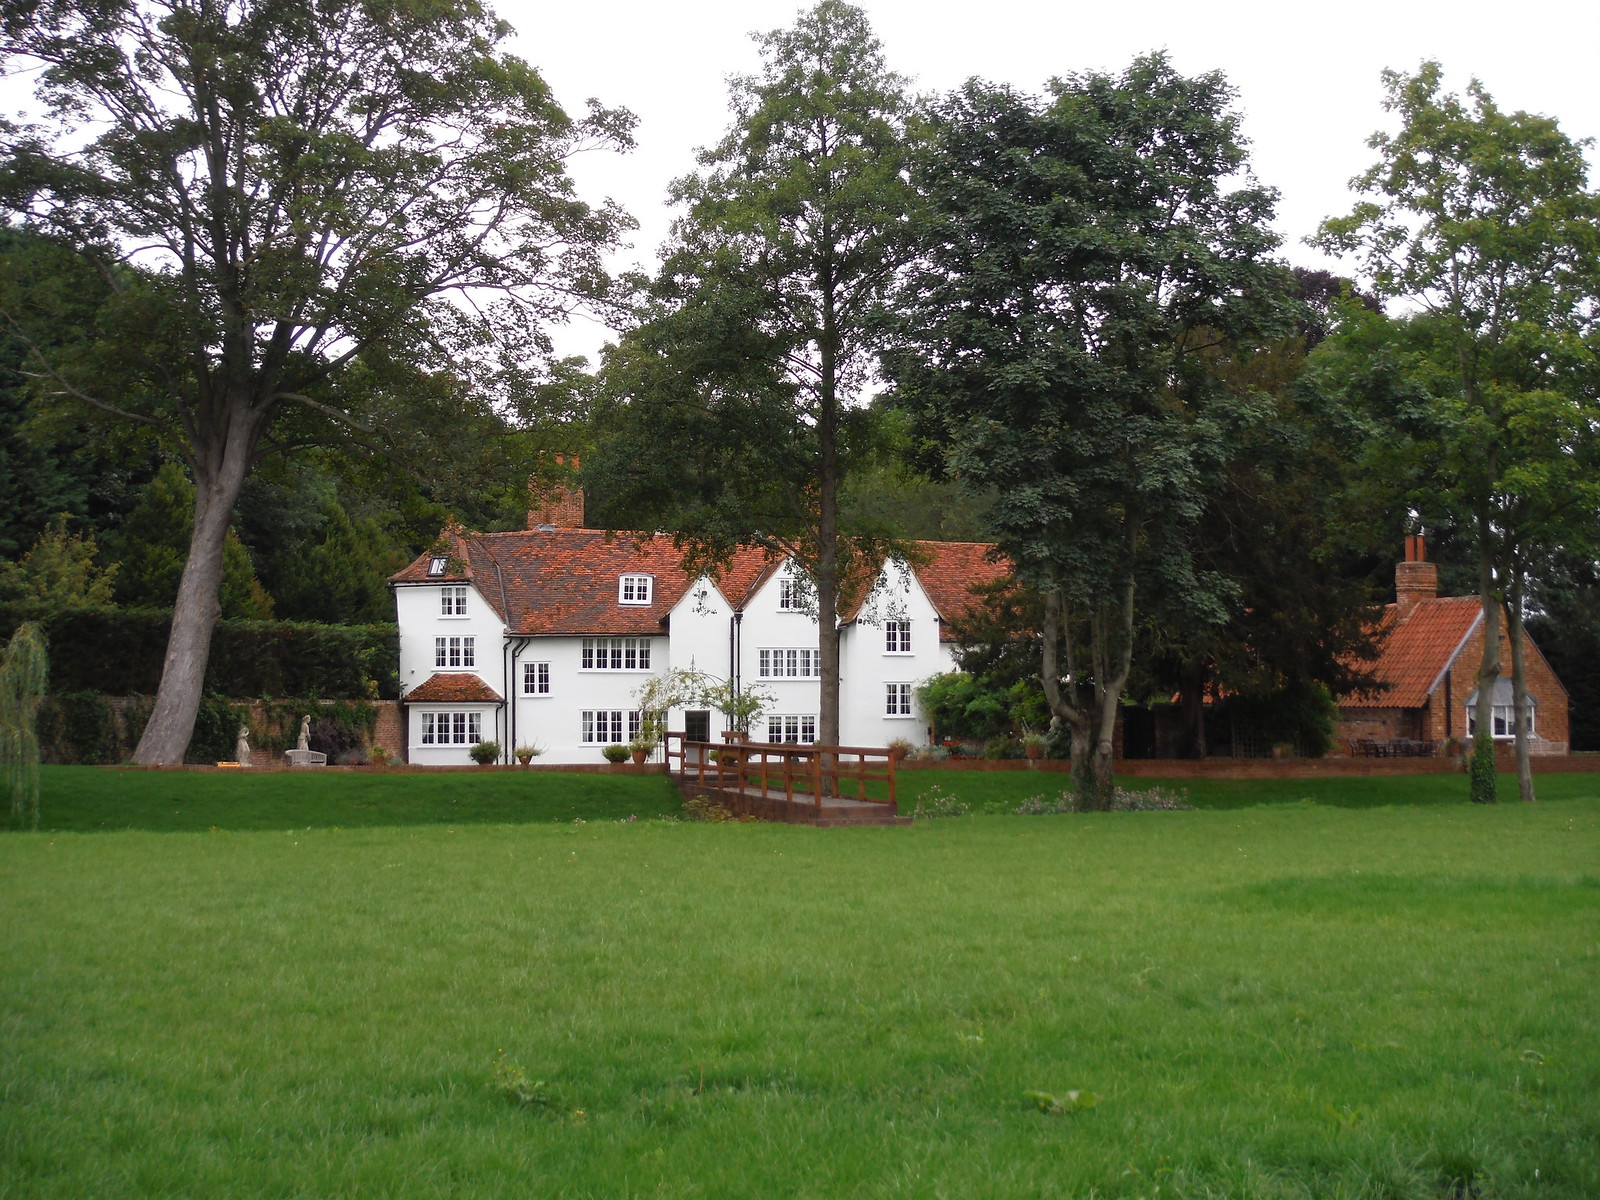 Hadham Mill SWC Walk 164 Roydon to Sawbridgeworth via Henry Moore Foundation